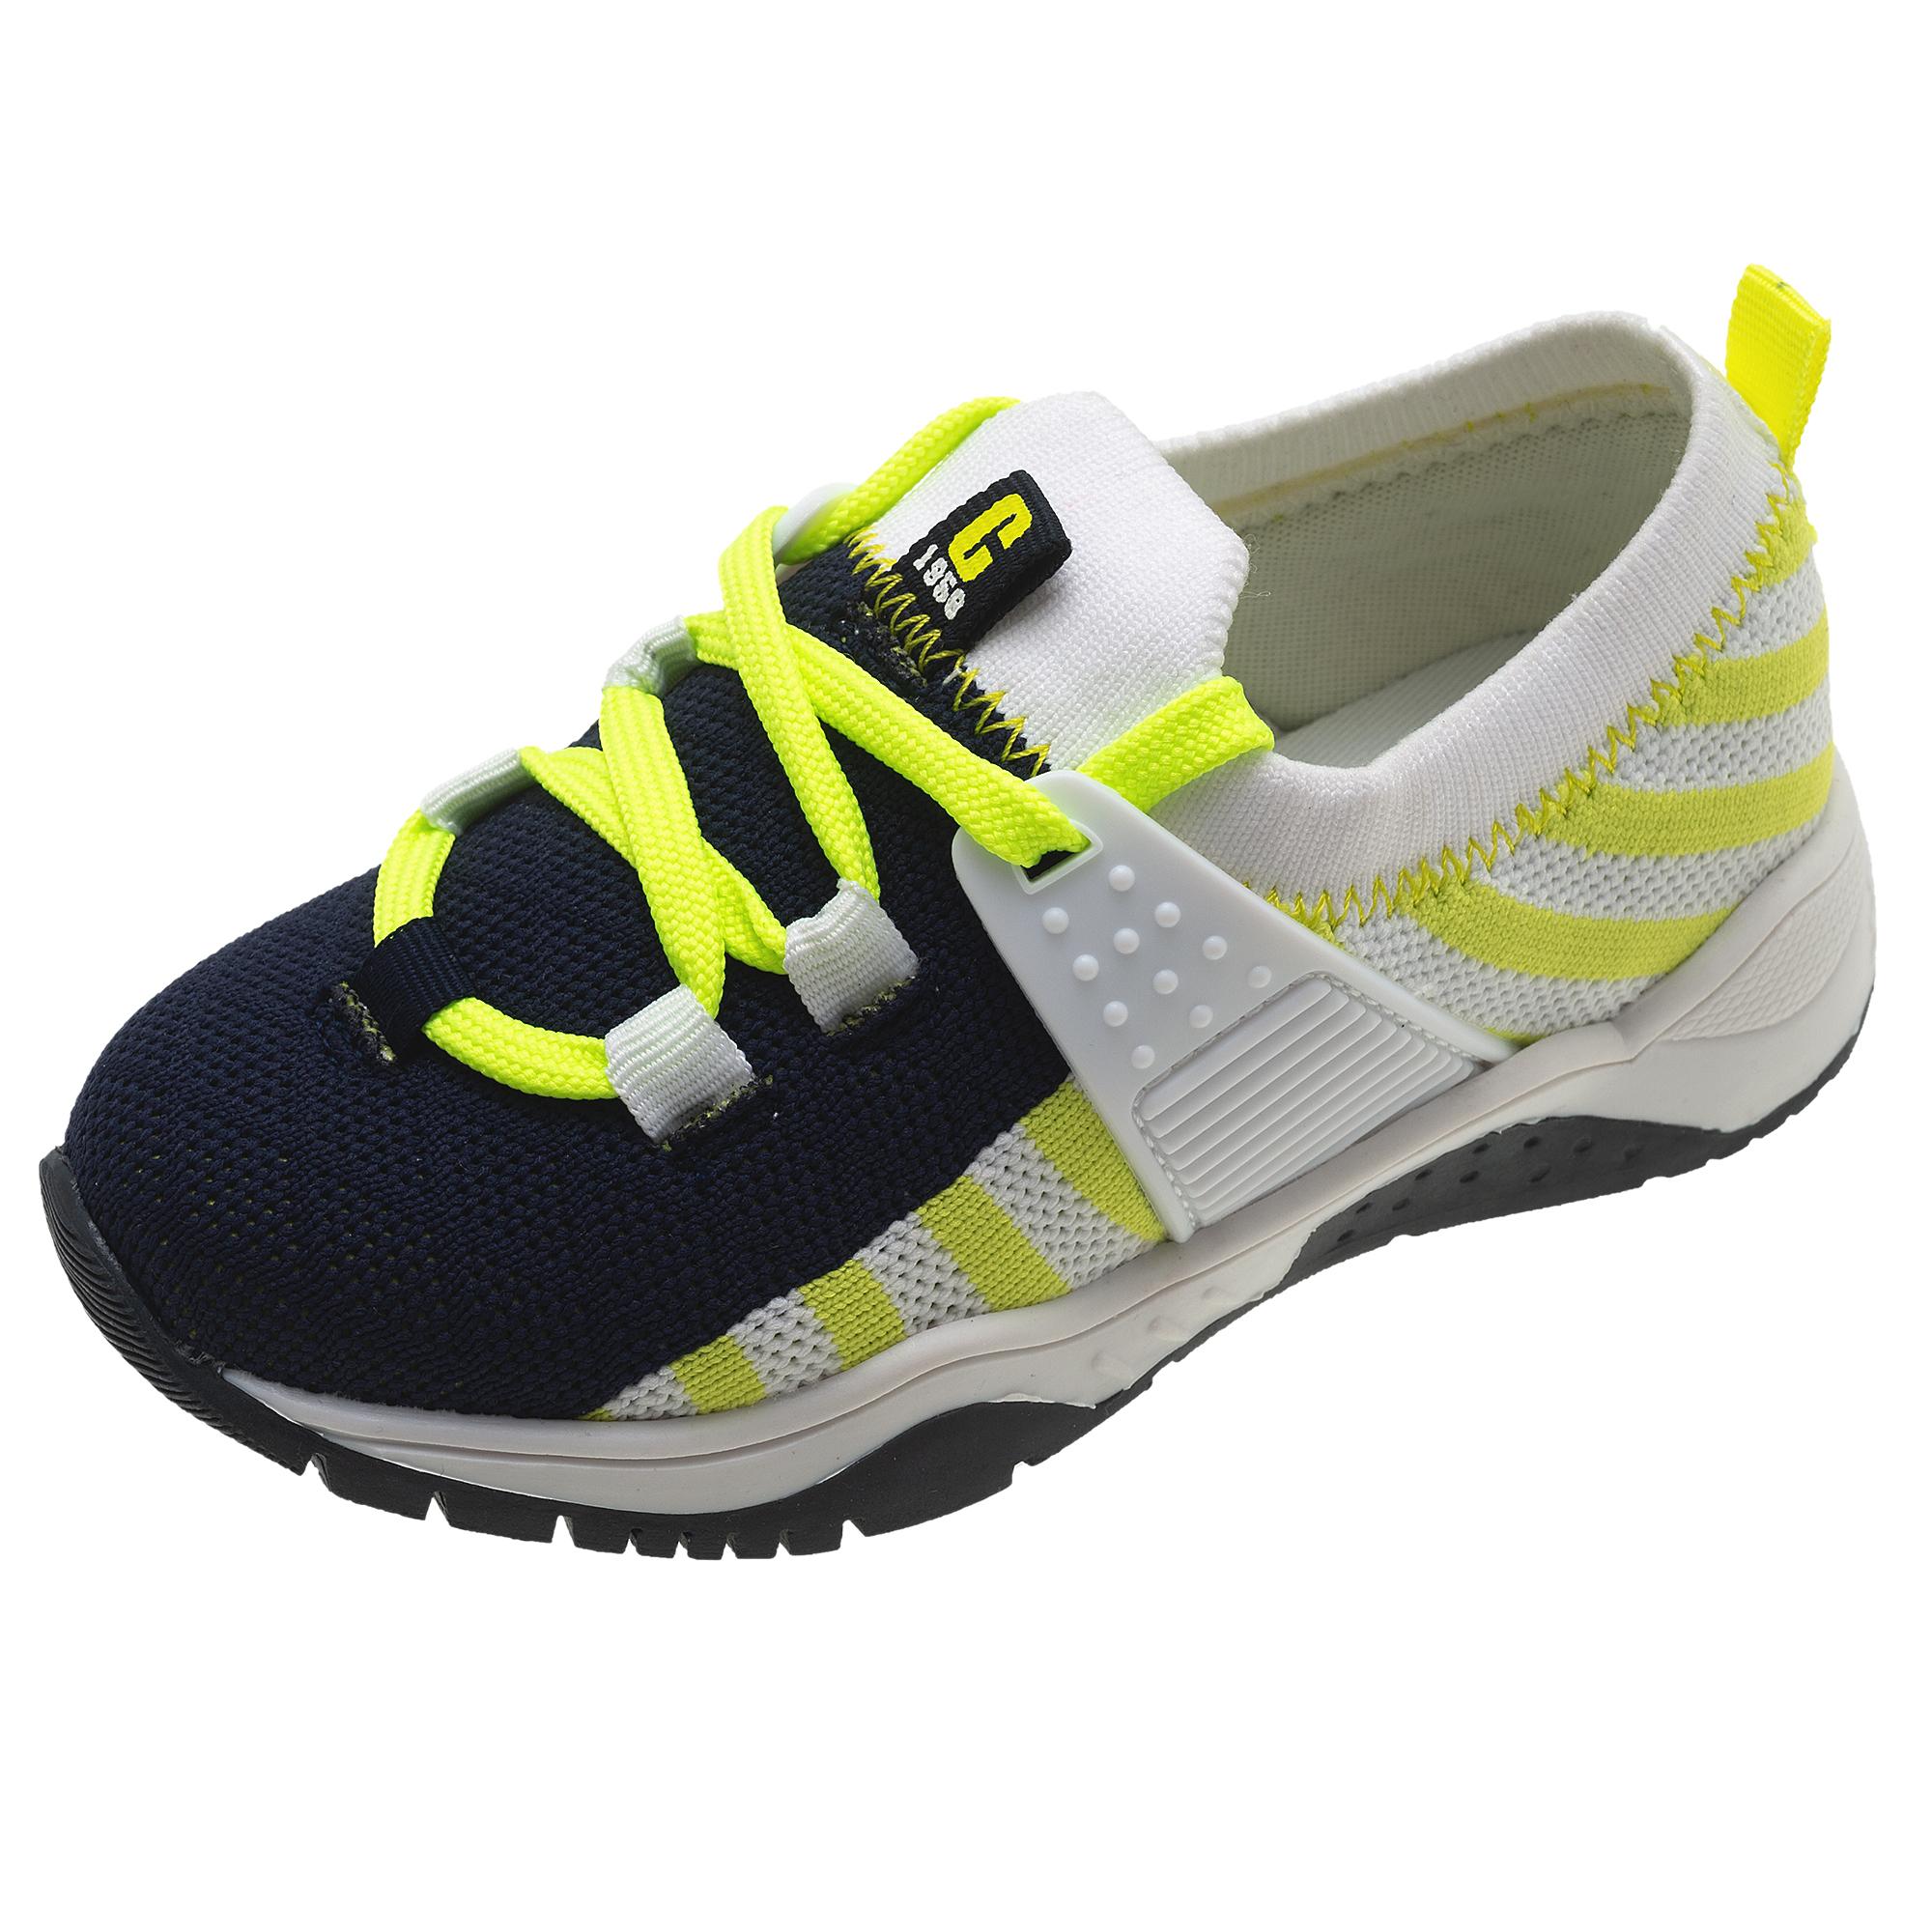 Pantofi sport copii Chicco Corner, textil bleumarin, 61617 din categoria Pantofi sport copii